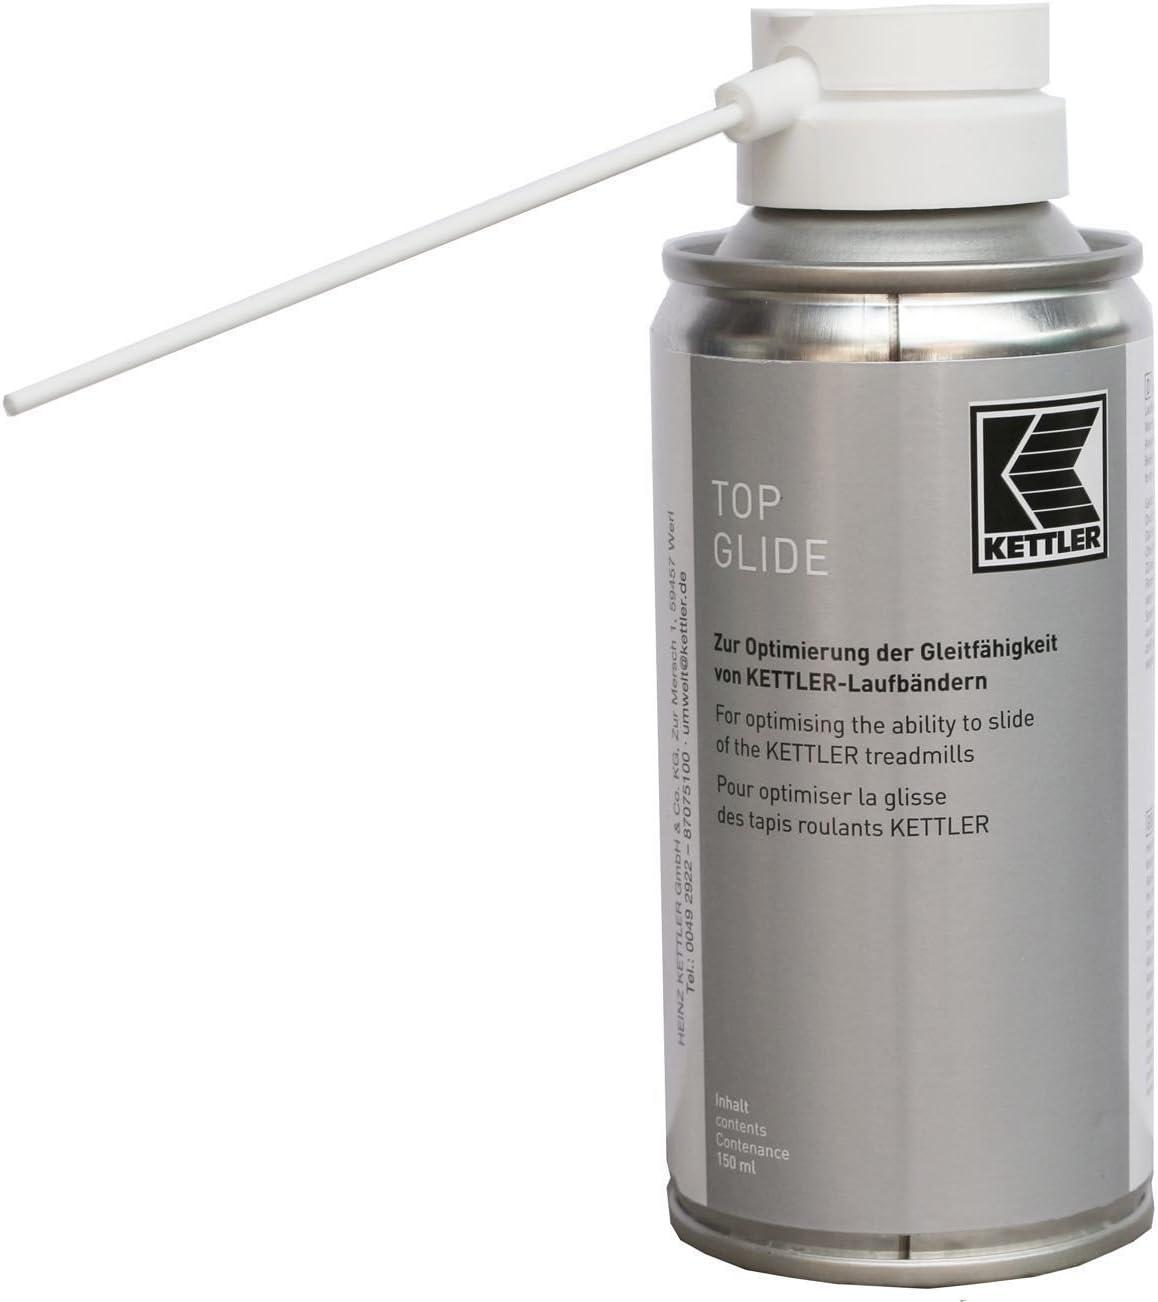 Kettler Cinta de Correr Spray Top Glide Pro 150 ml Unidad de Cinta ...